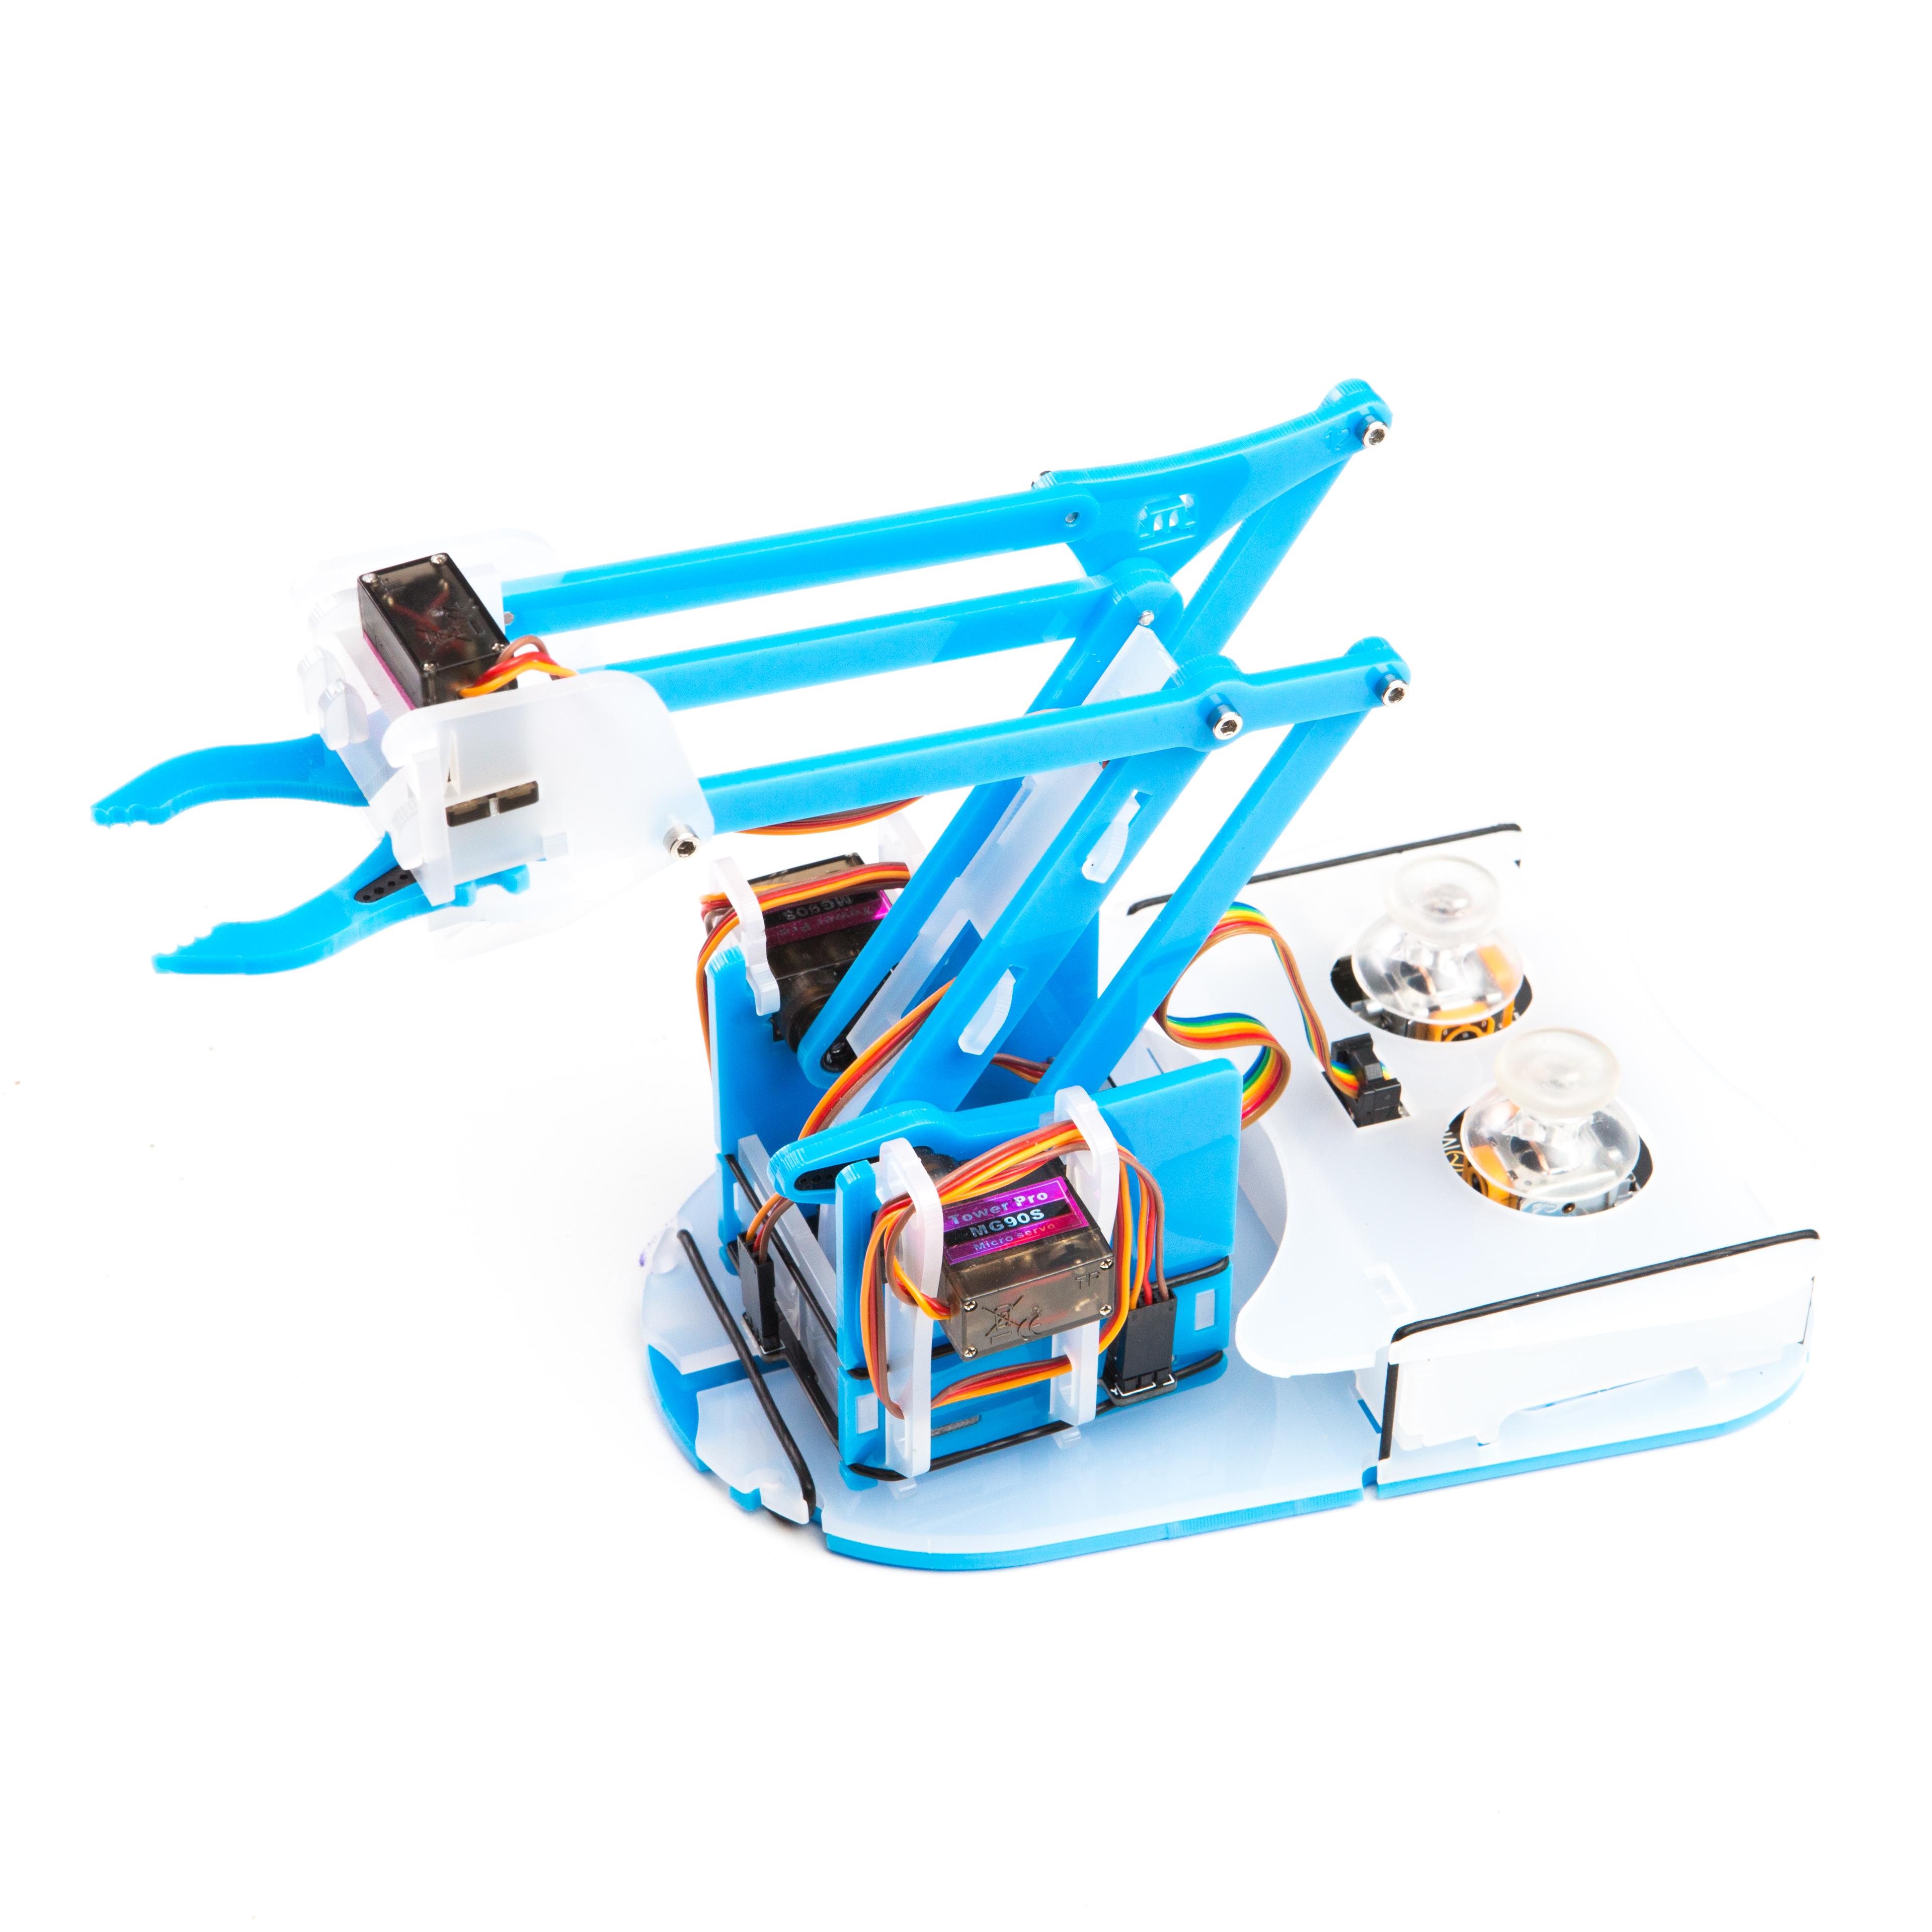 MeArm Pi - Roboterarm für Raspberry Pi   EXP Tech